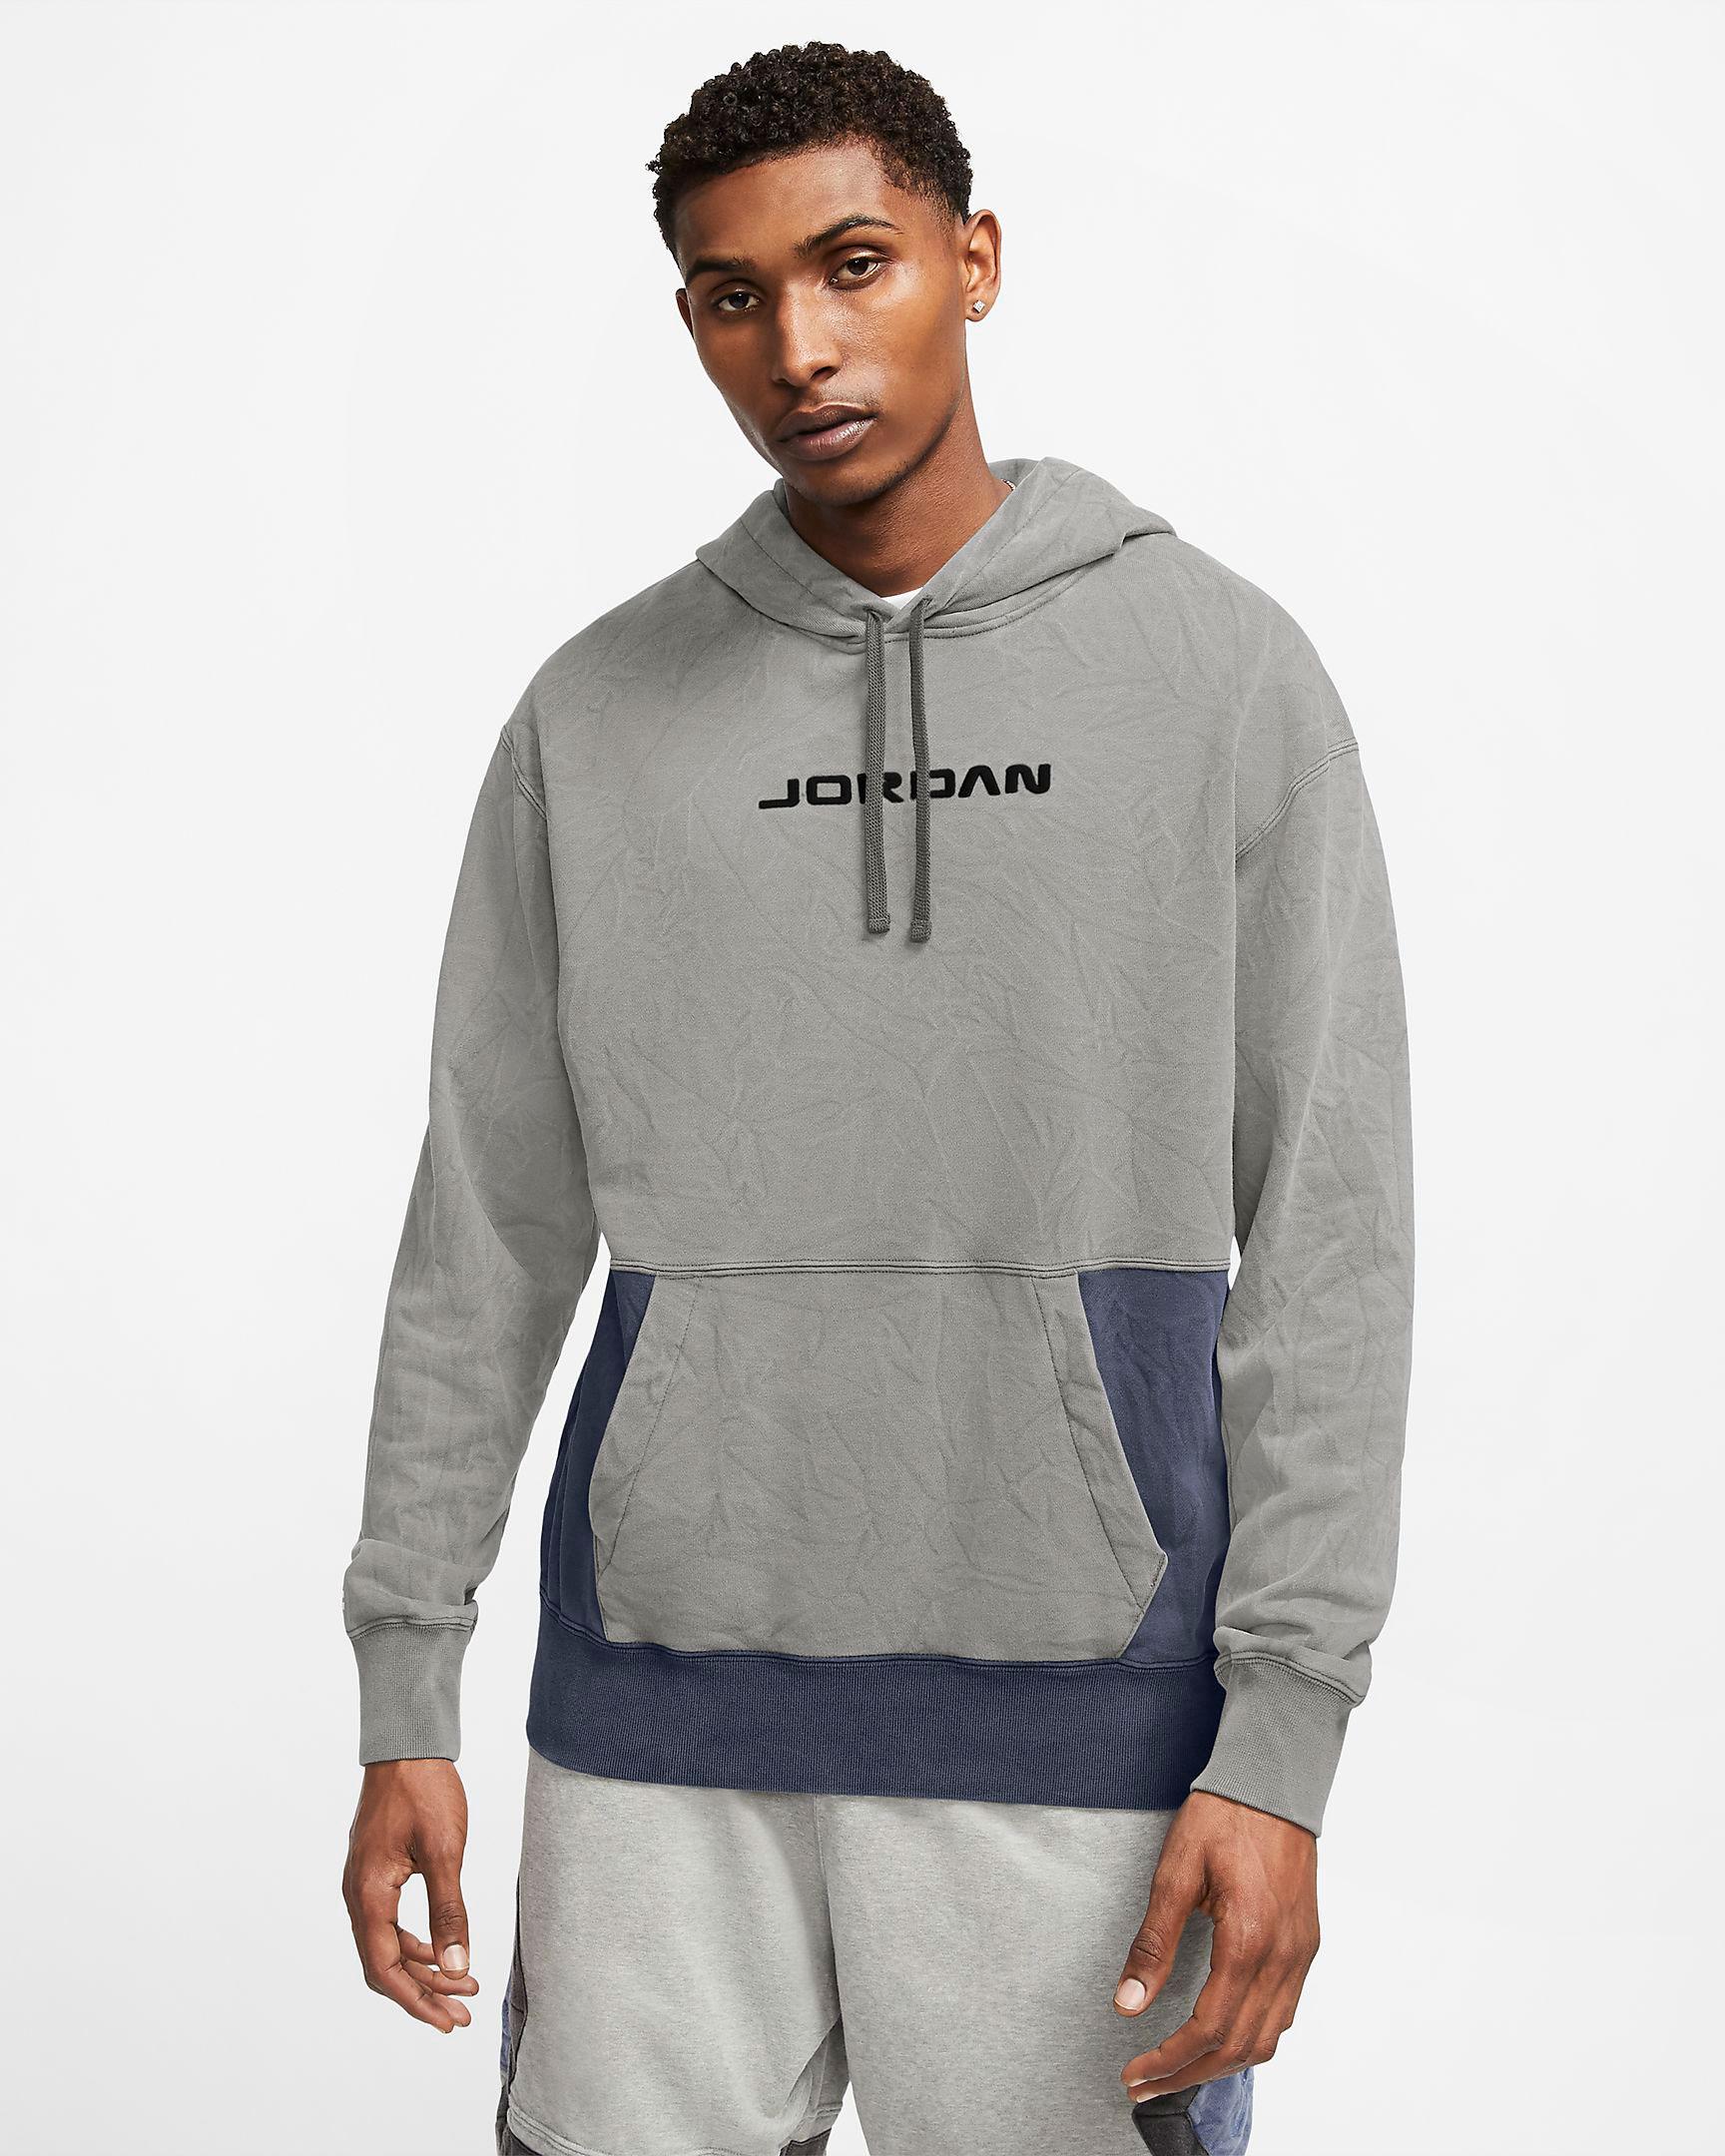 jordan-1-midnight-navy-hoodie-match-1